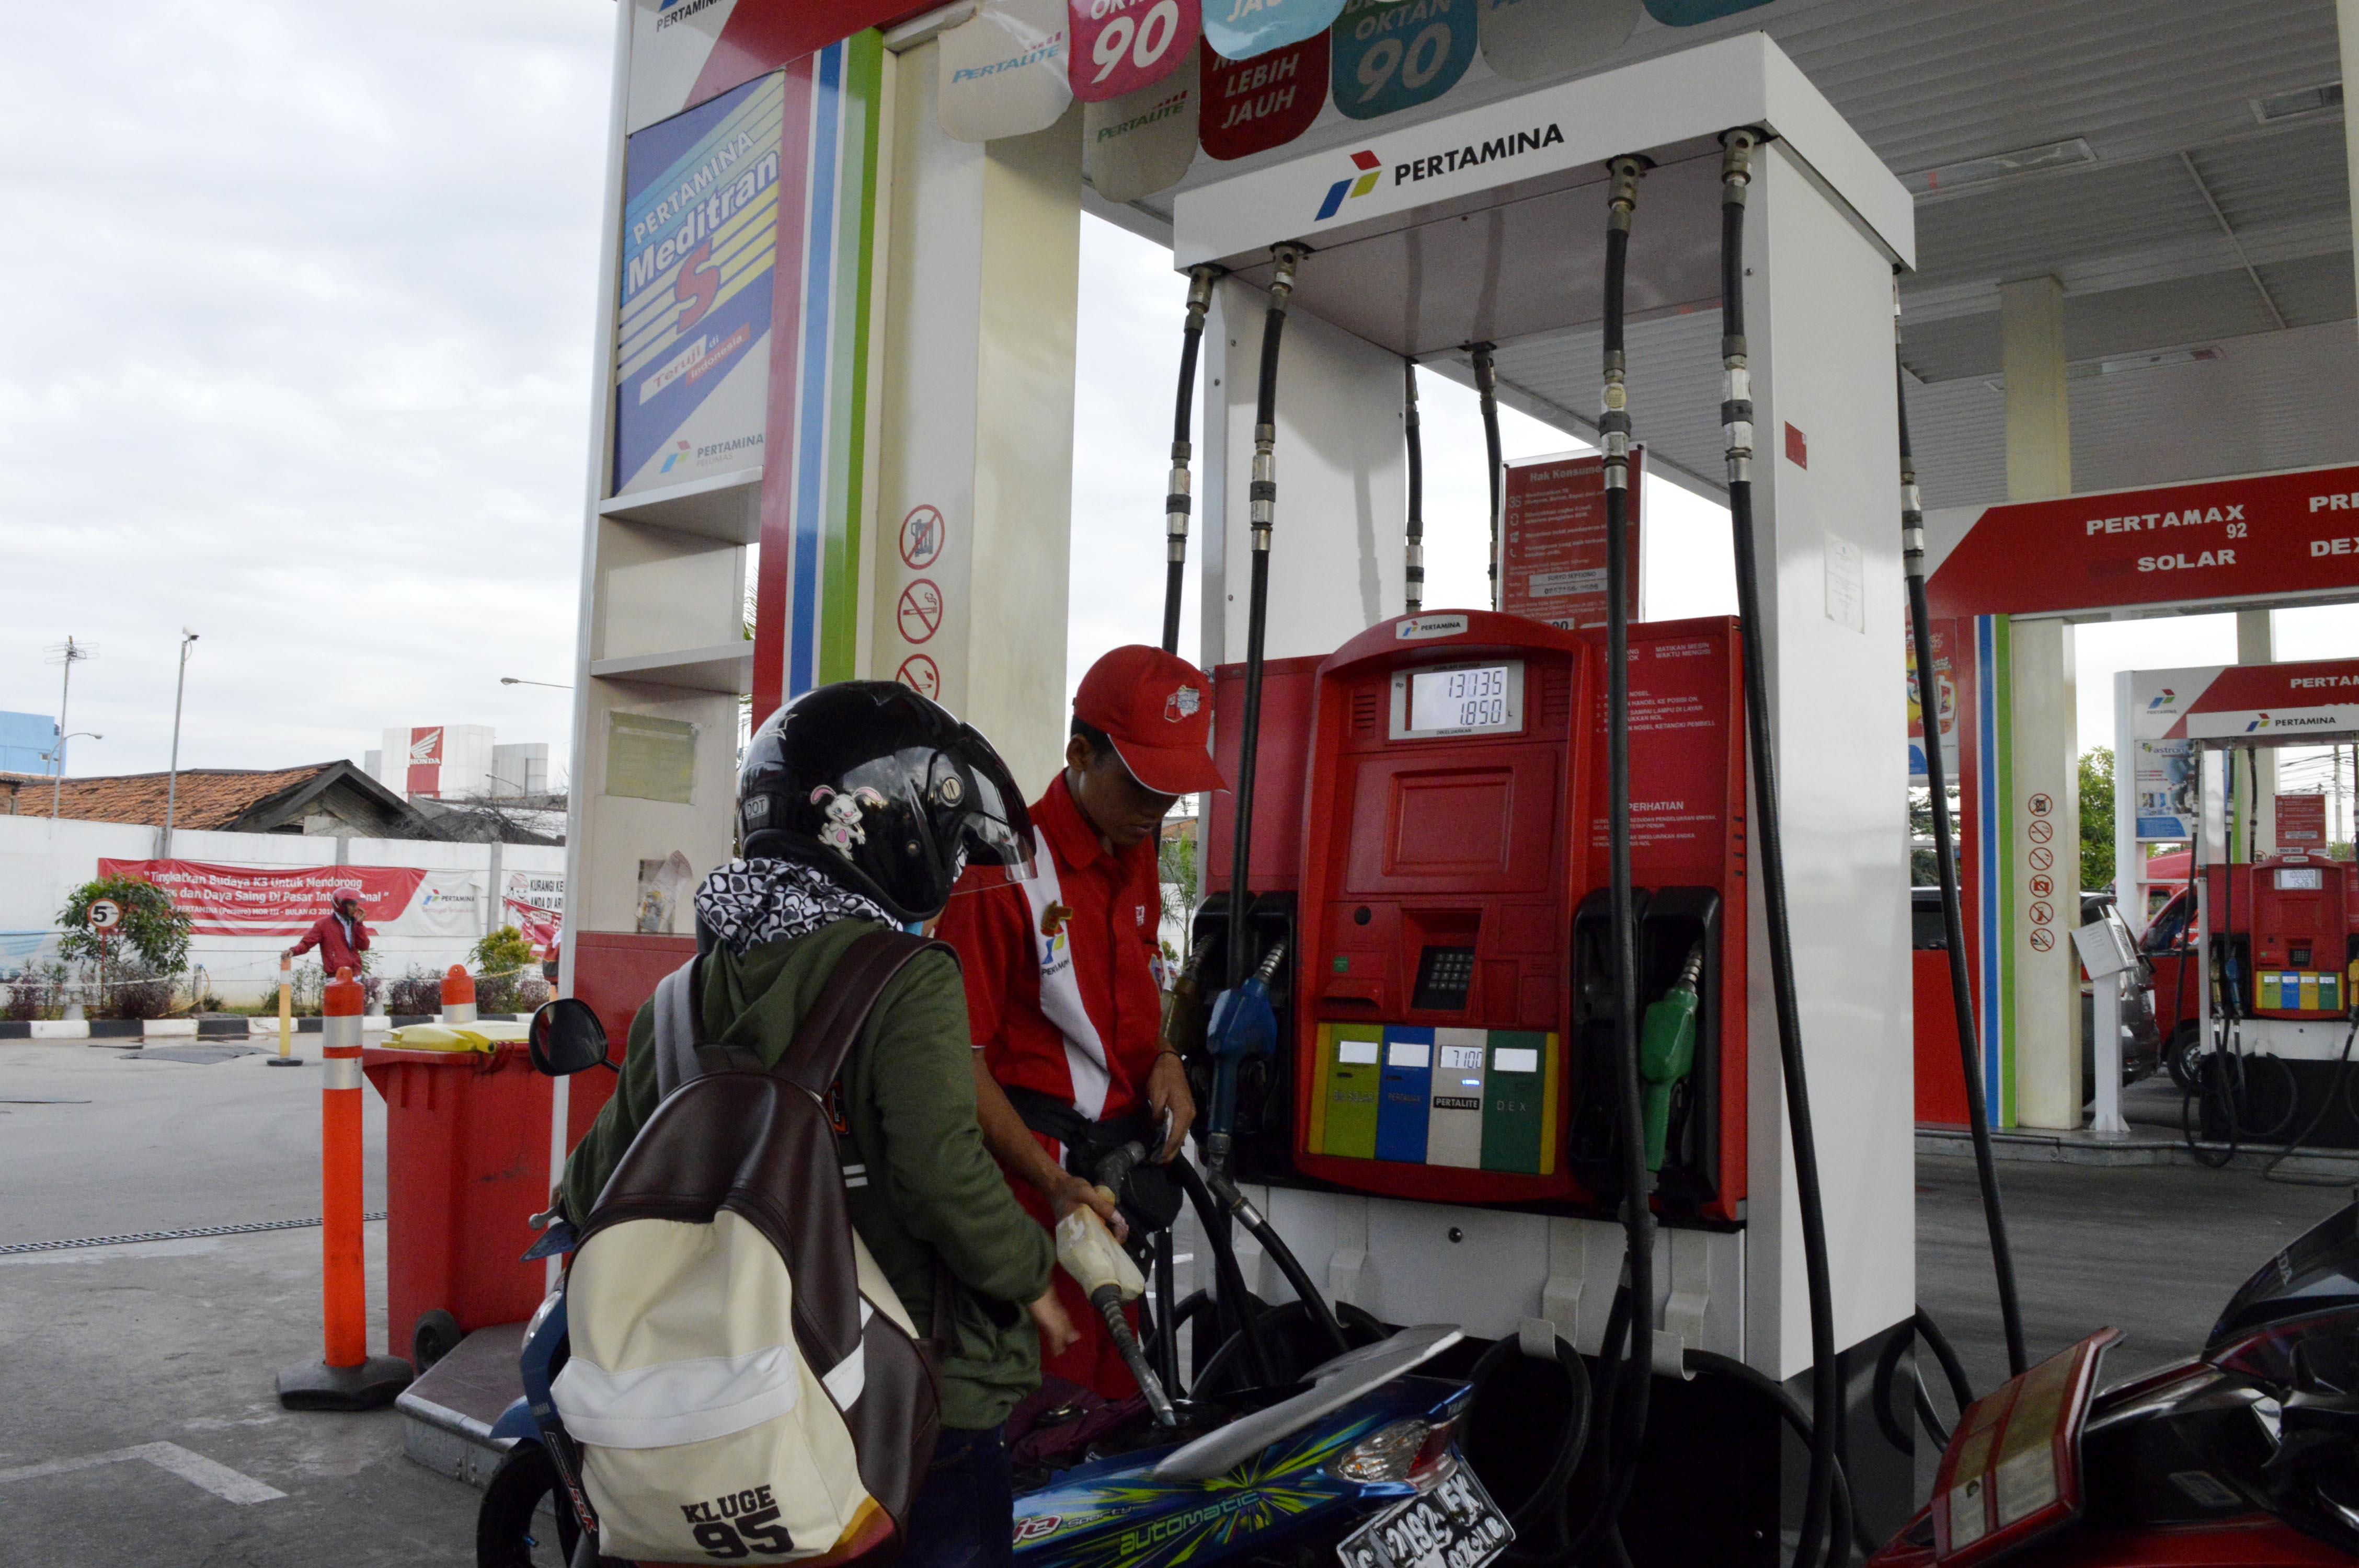 Pertamina Siap Turunkan Harga BBM Nonsubsidi